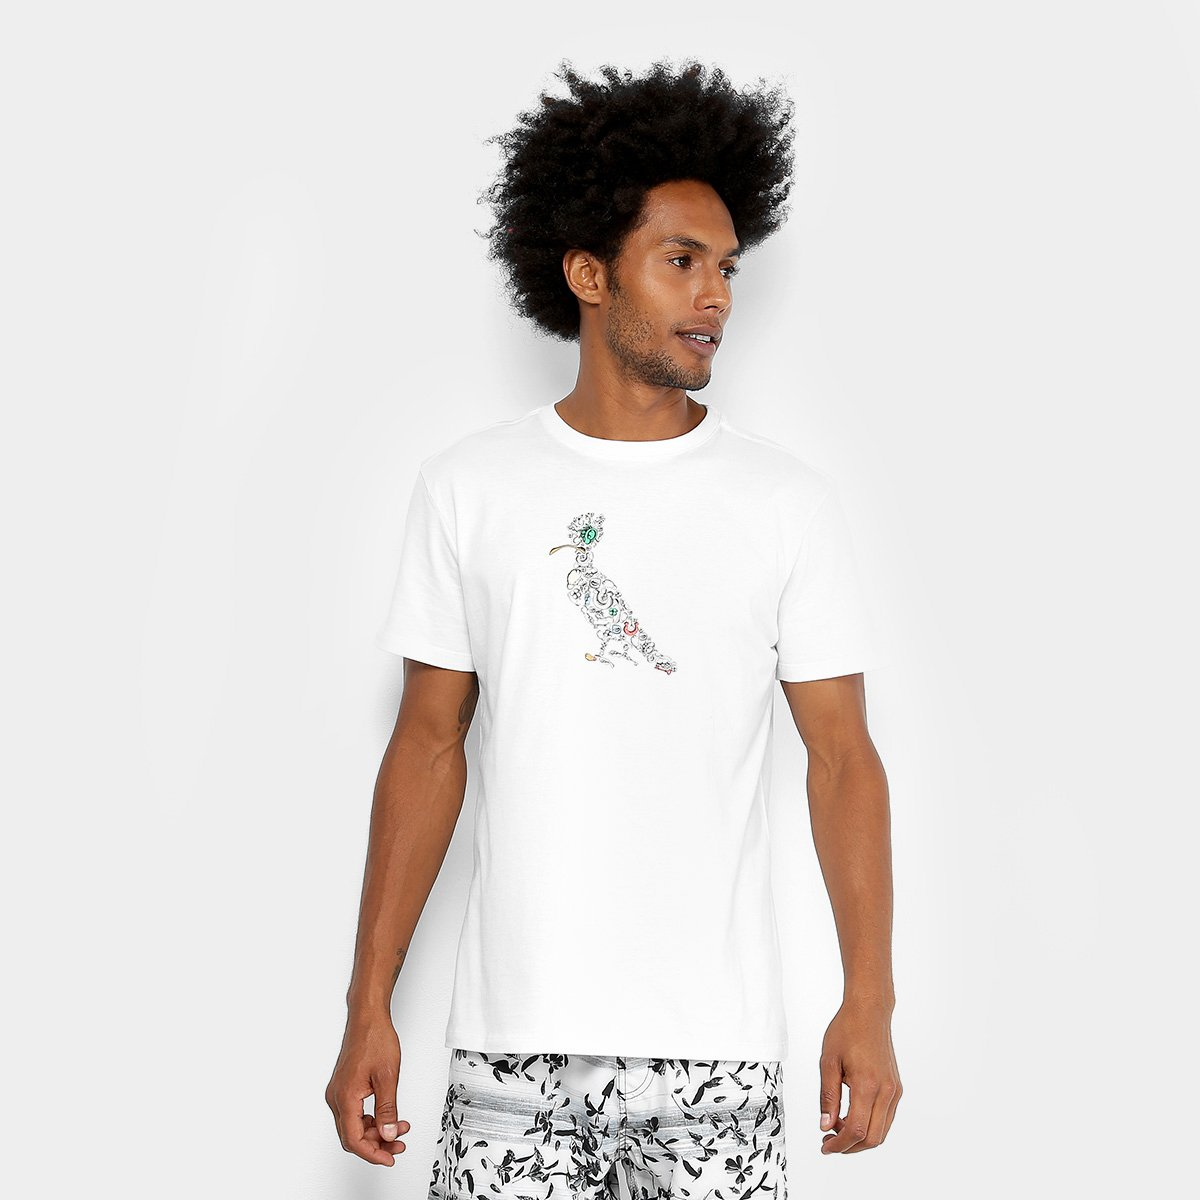 Camiseta Reserva Pica-pau Ano Novo Masculina. undefined e45a5f2634b02